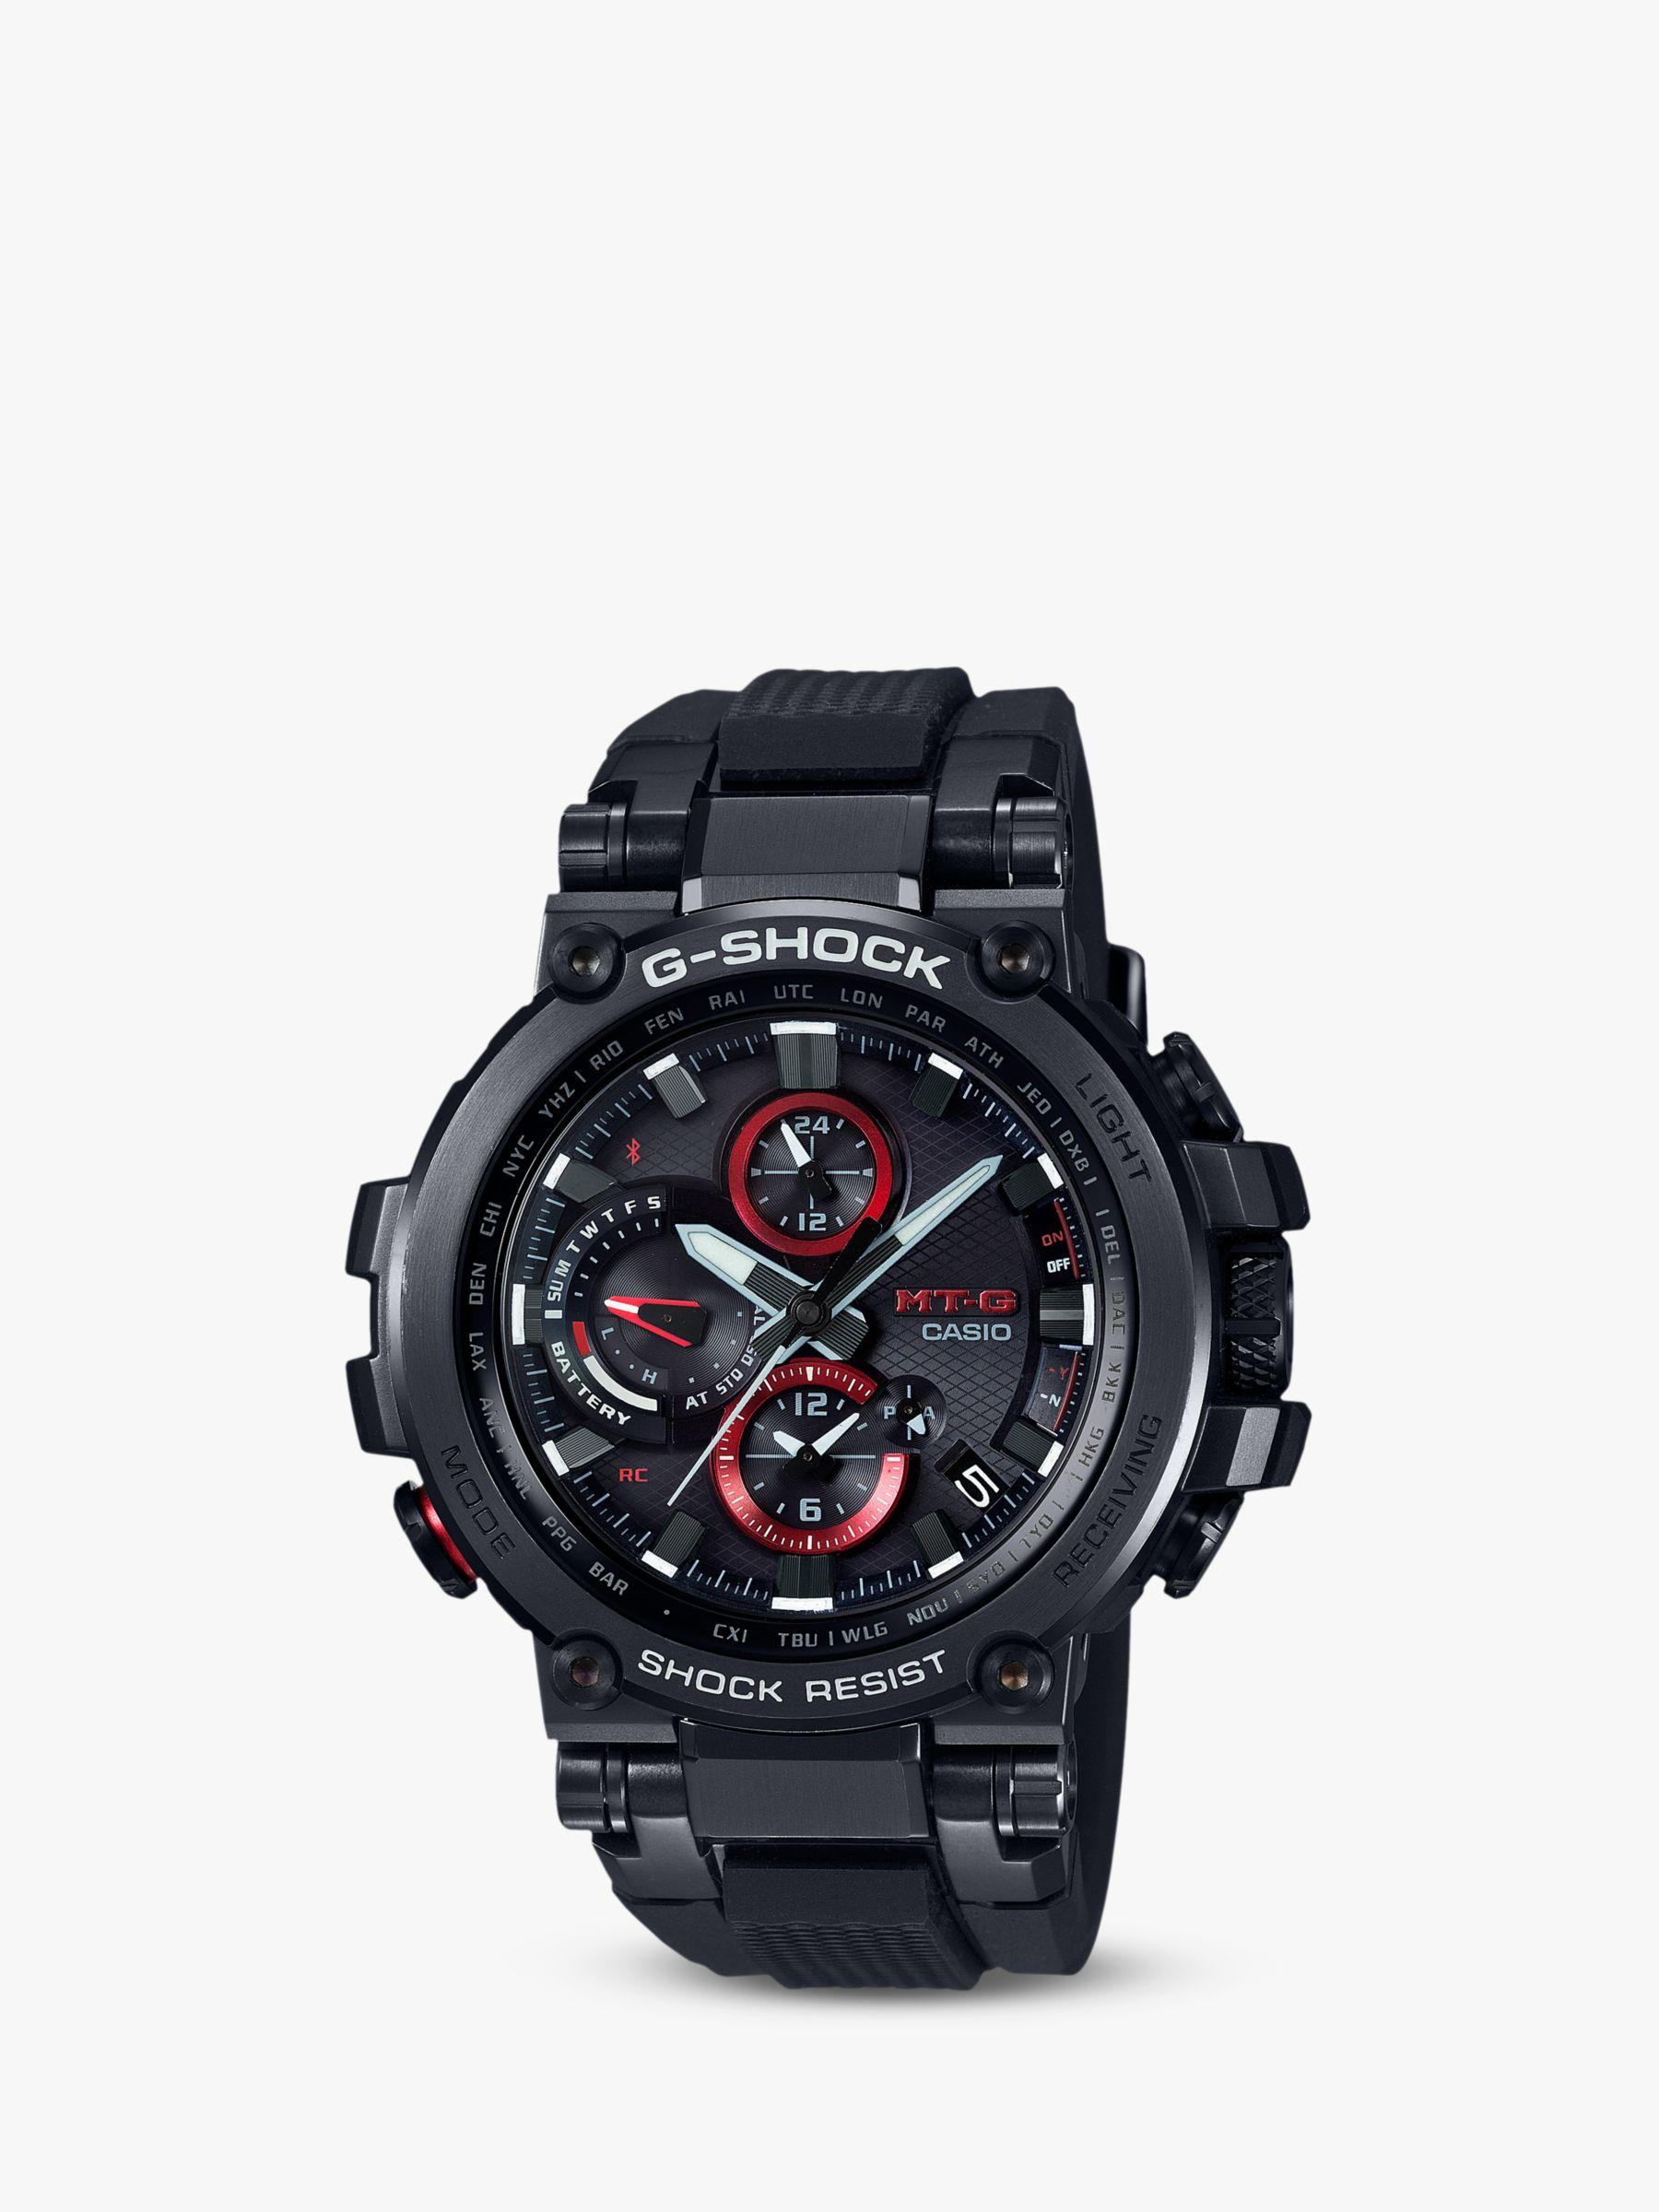 Casio Casio MTG-B1000B-1AER Men's G-Shock Connected Chronograph Bracelet Strap Watch, Black